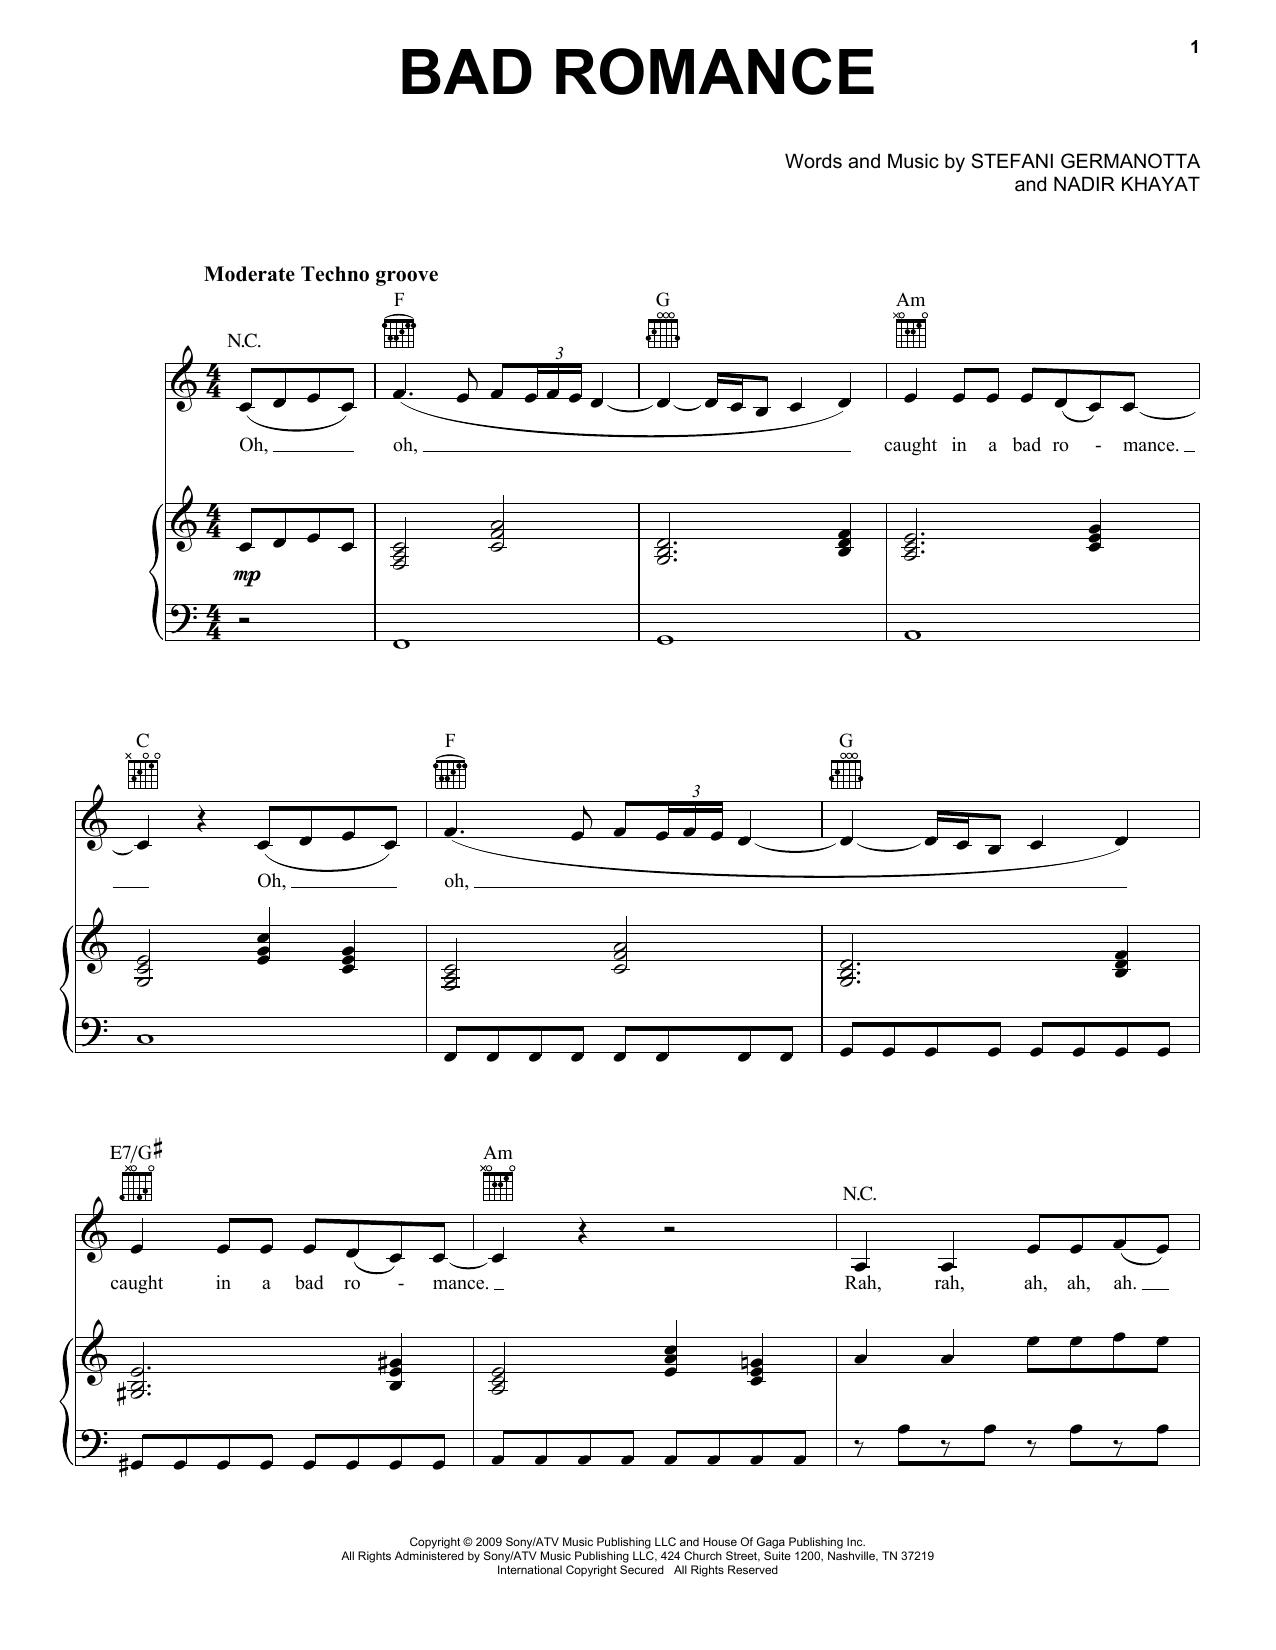 Bad Romance sheet music